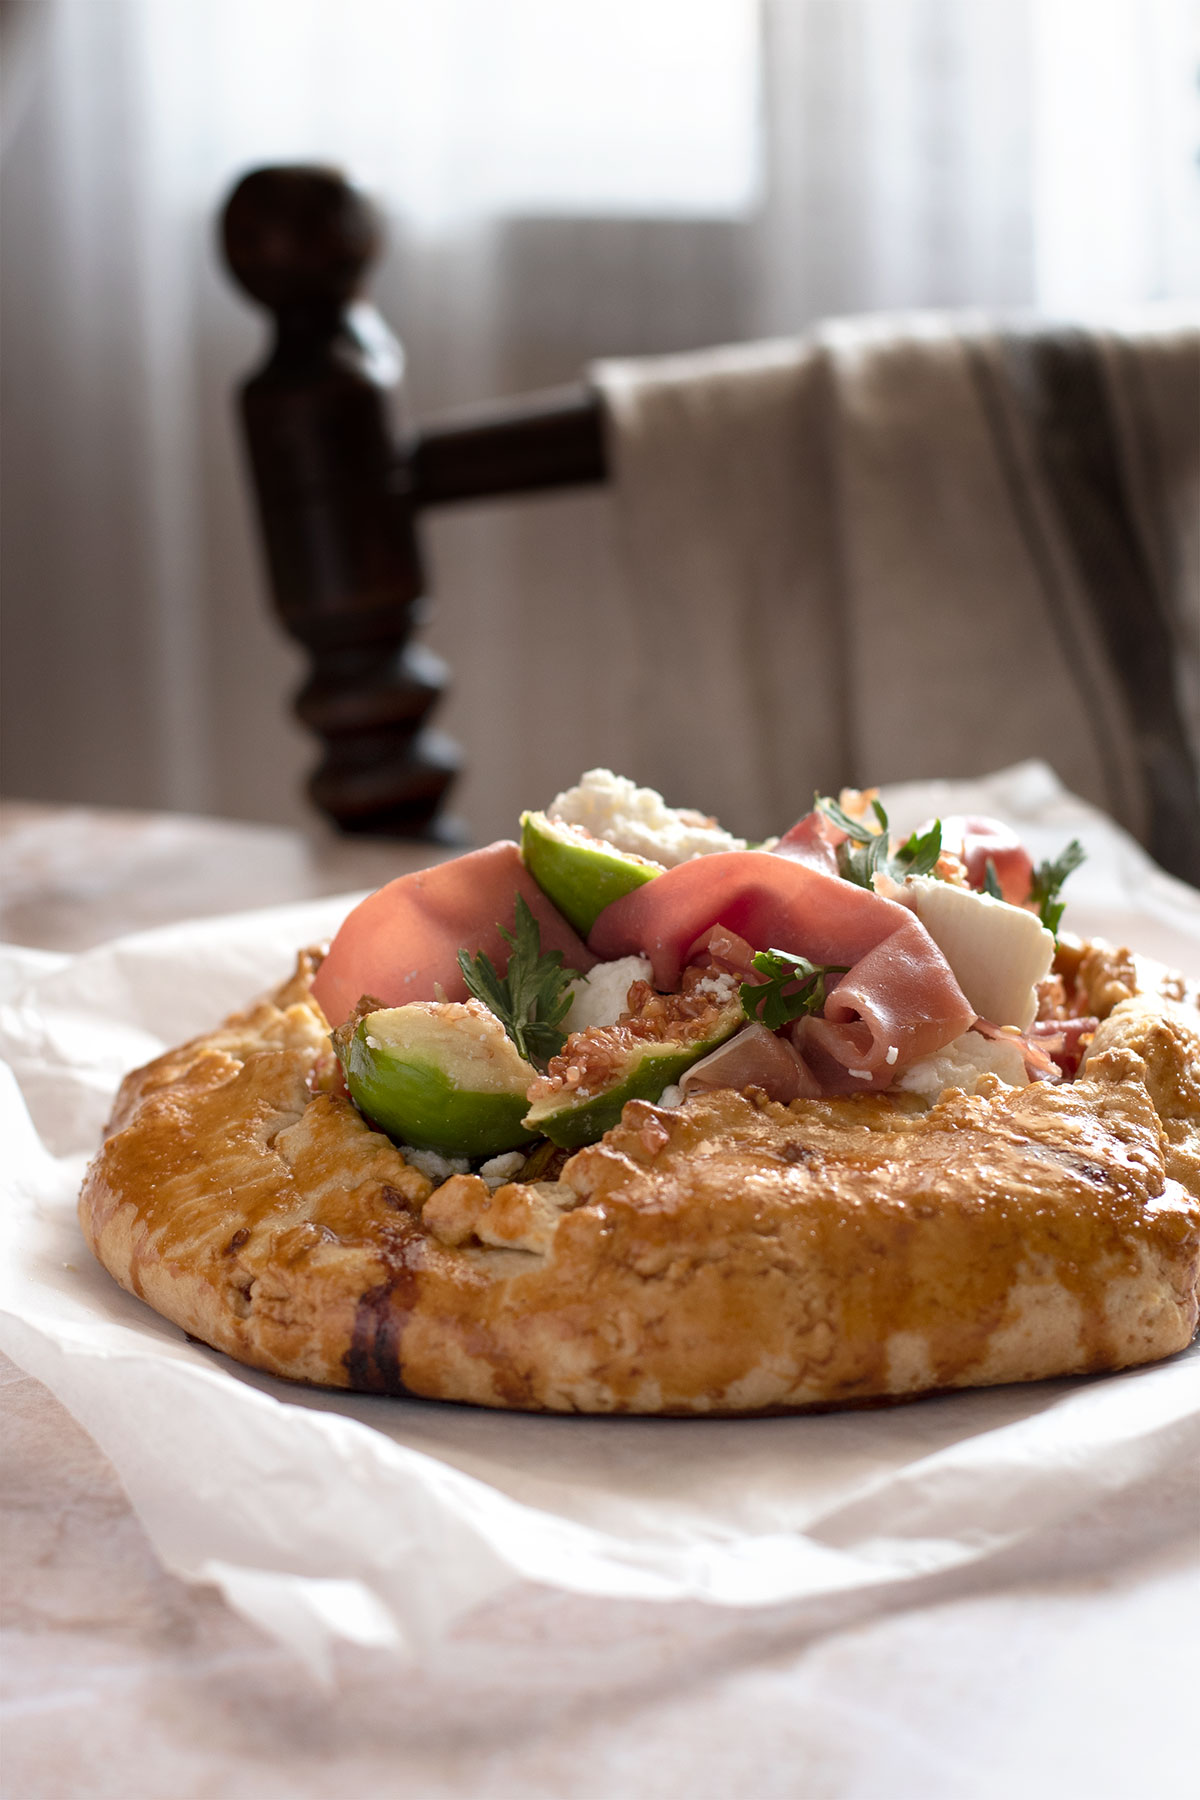 galette τάρτα με σύκα προσιούτο τυριά μανούρι μπαλσάμικο